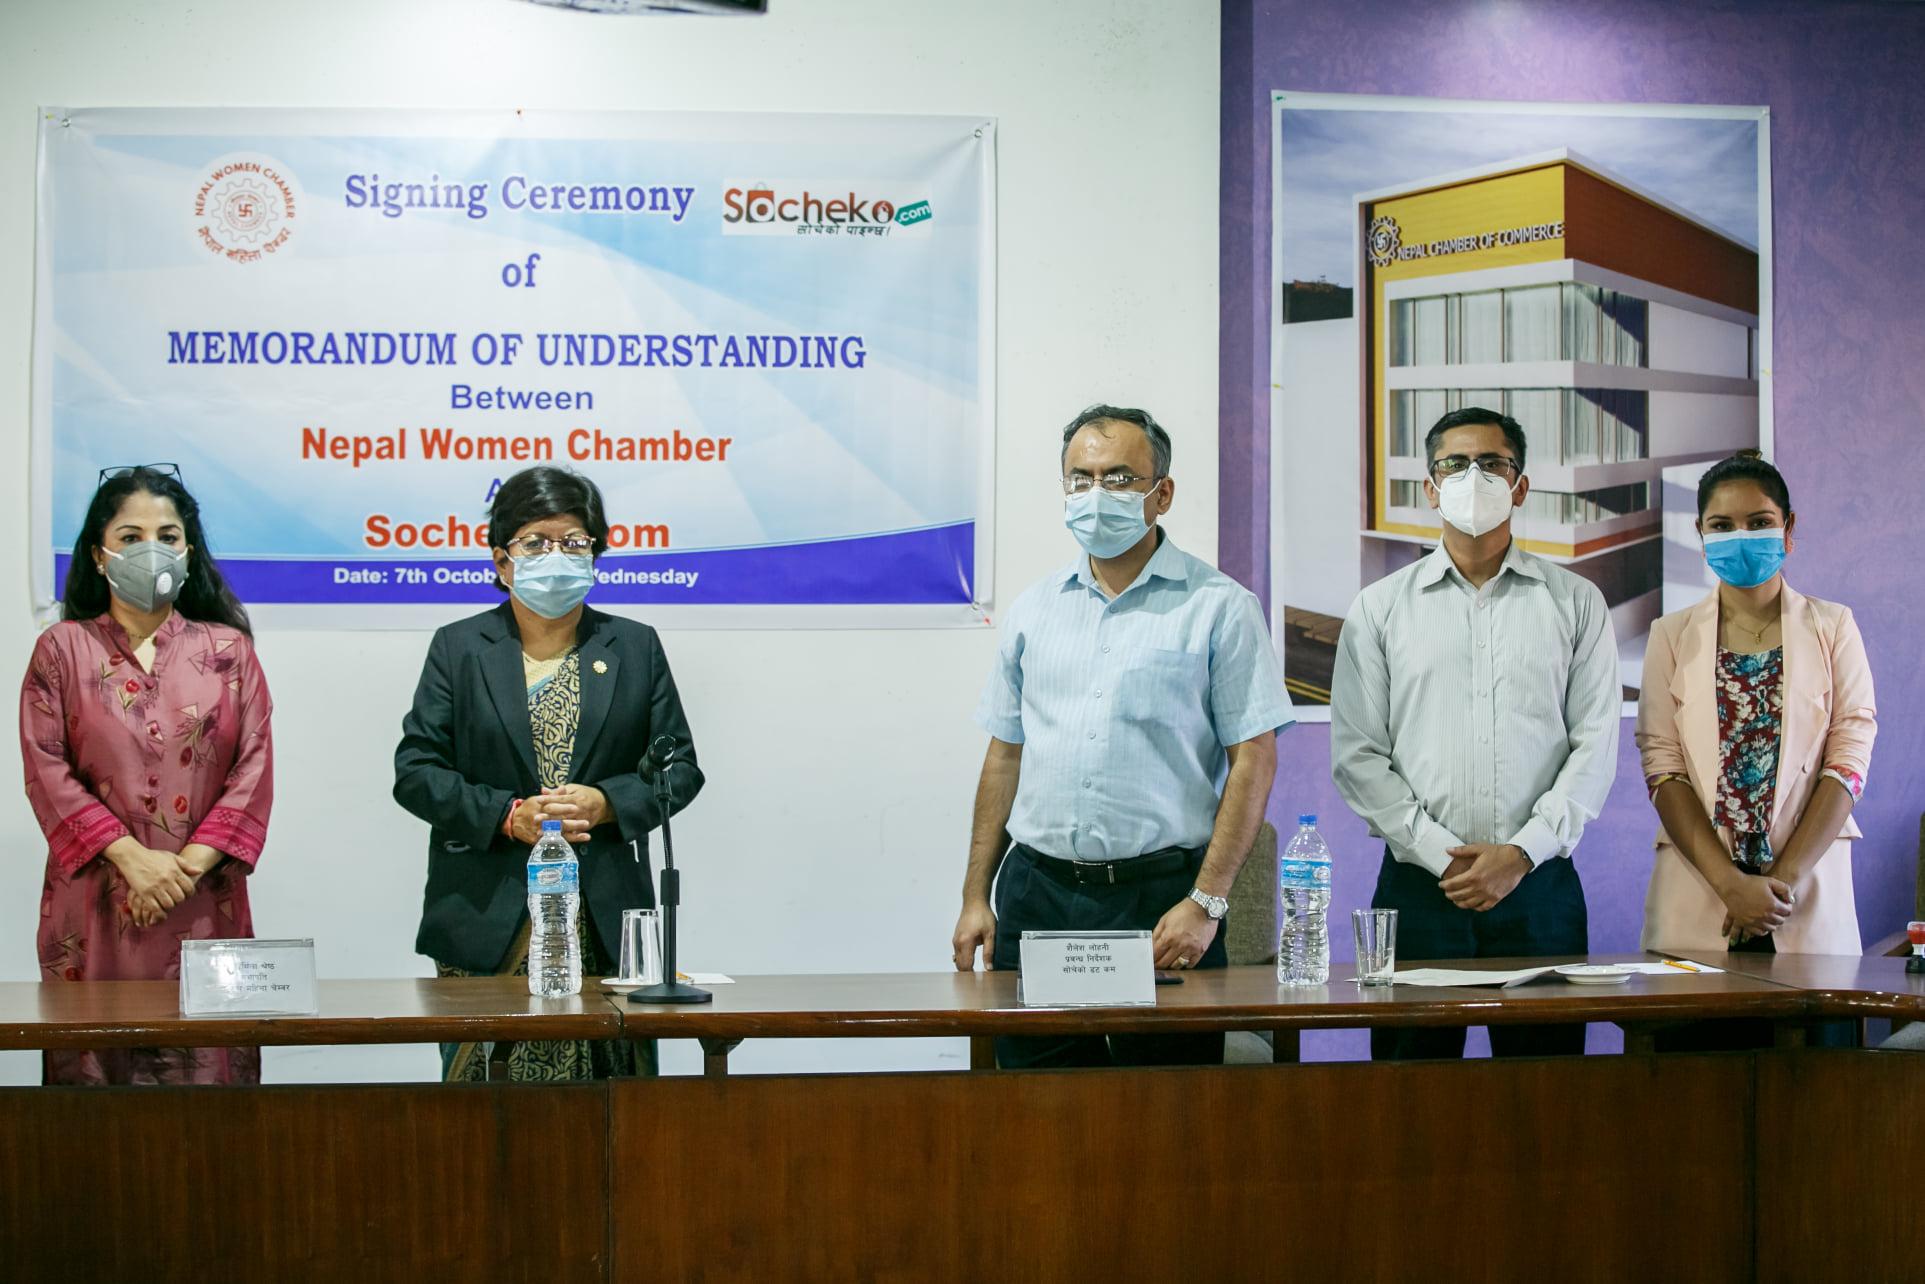 नेपाल महिला चेम्बर र सोचेको डटकमबीच सम्झौता